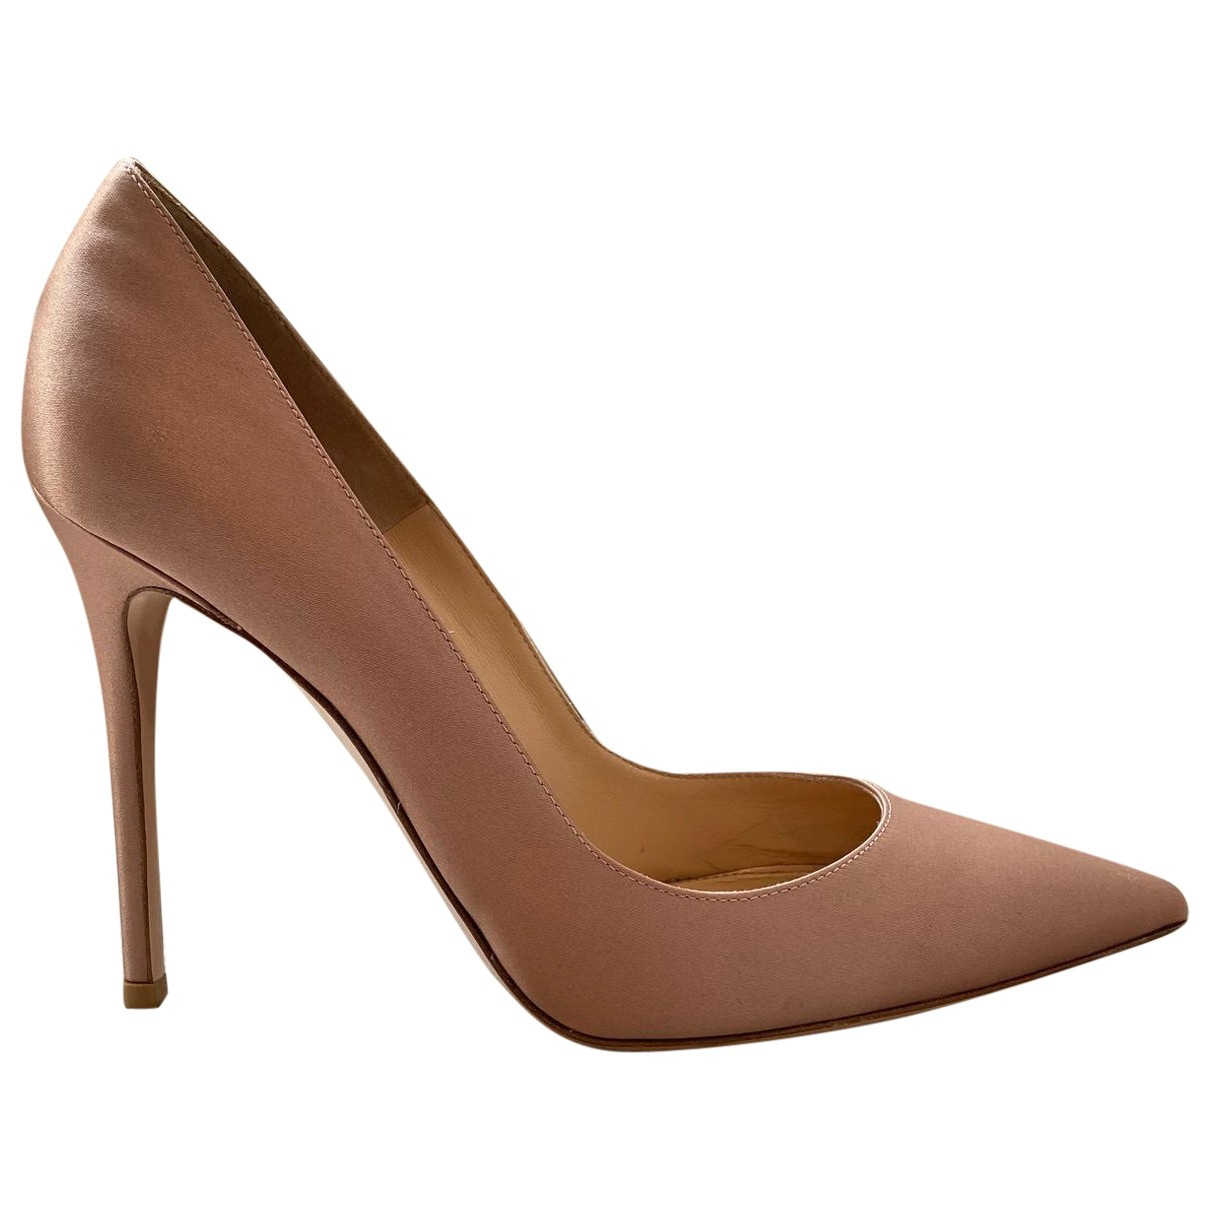 Gianvito Rossi Gianvito Pink Cloth Heels for Women 40.5 EU